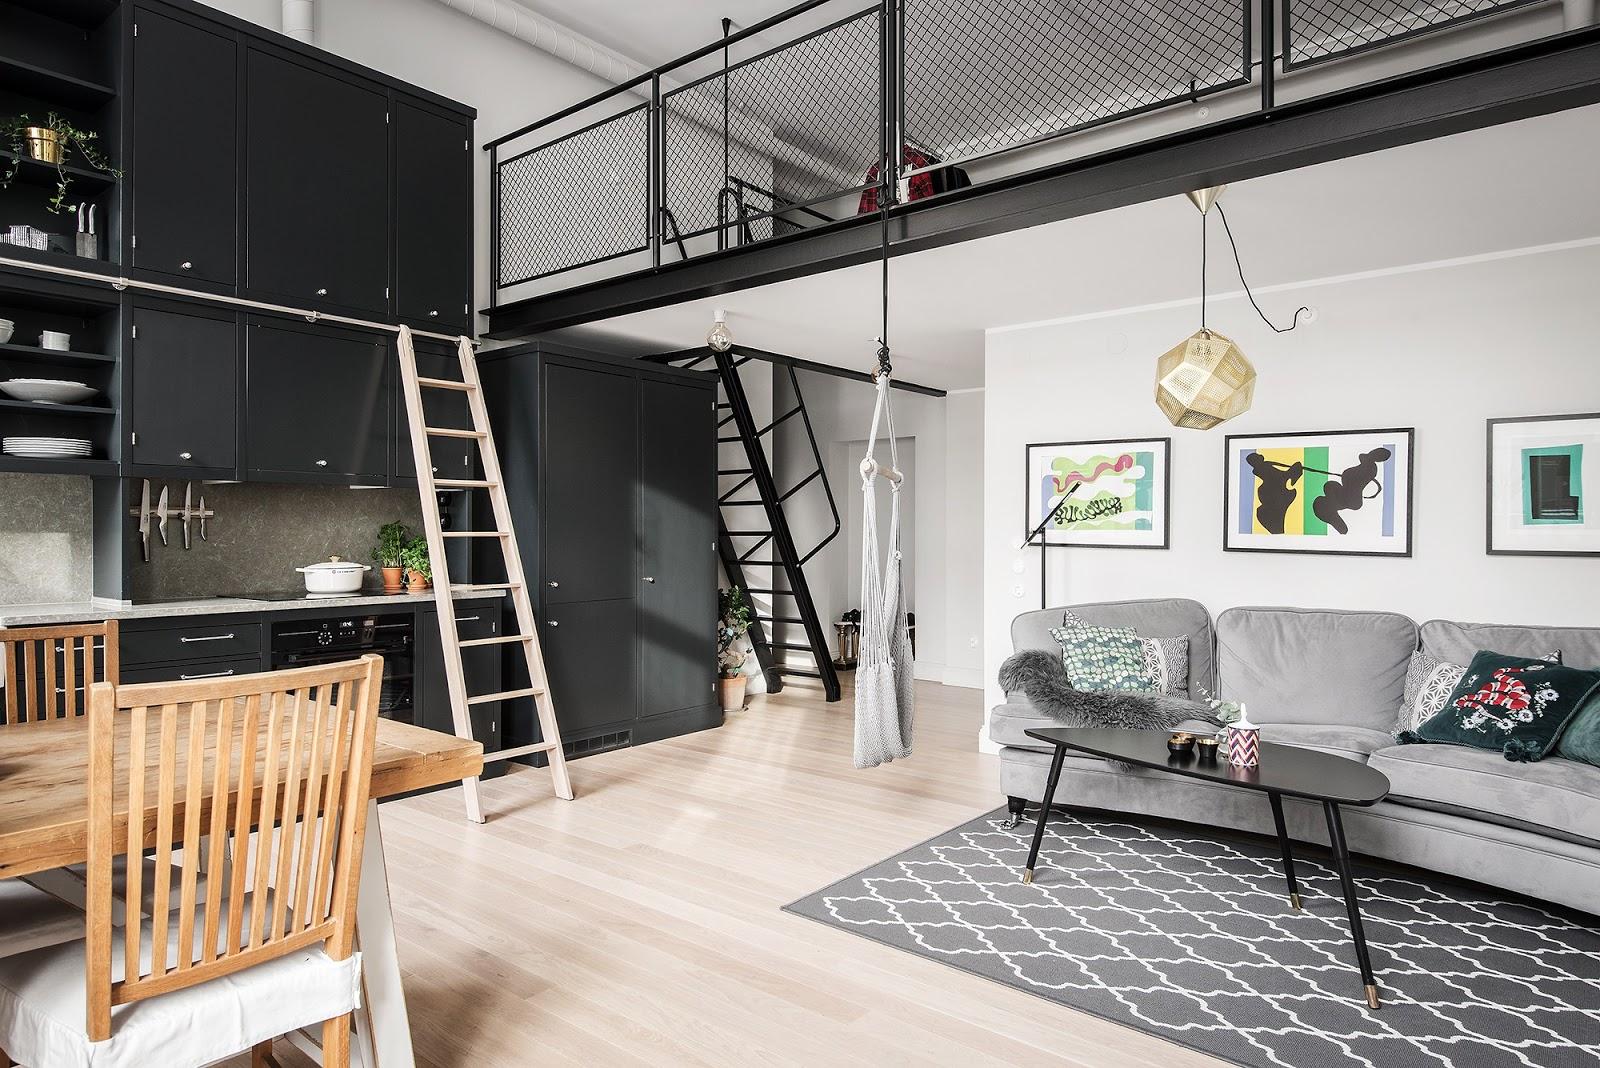 Hamac în living - Design interior